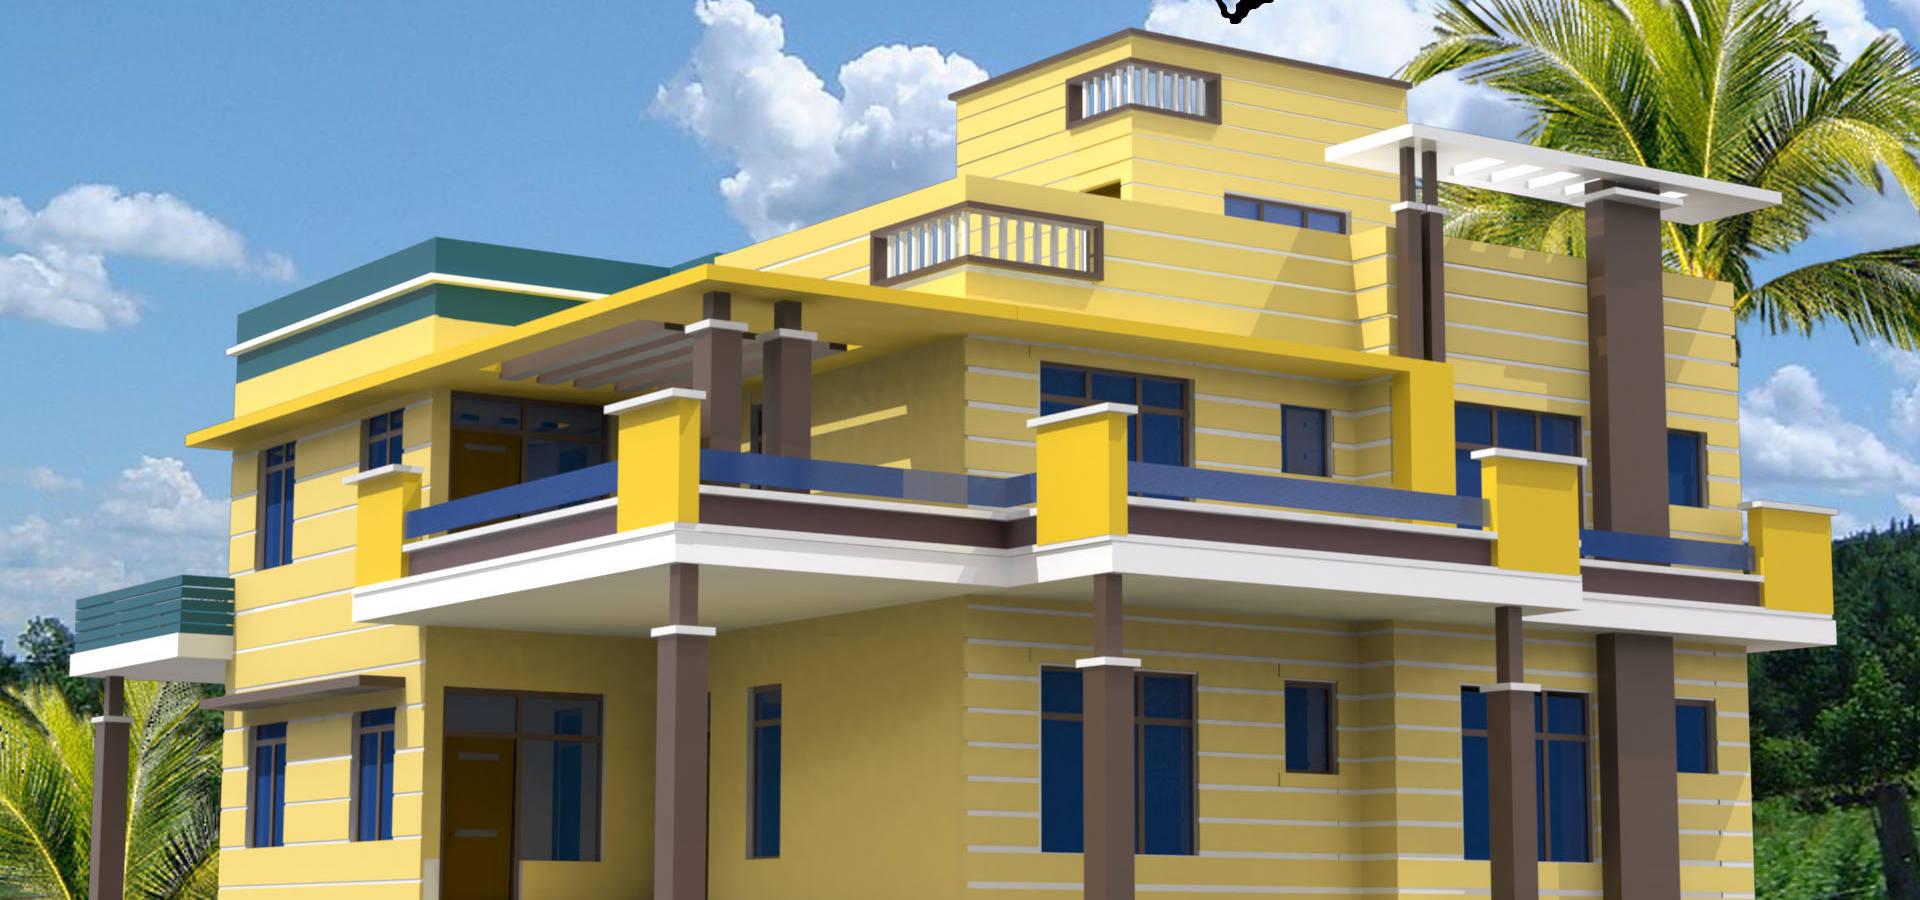 Mannat Architect & Consultants